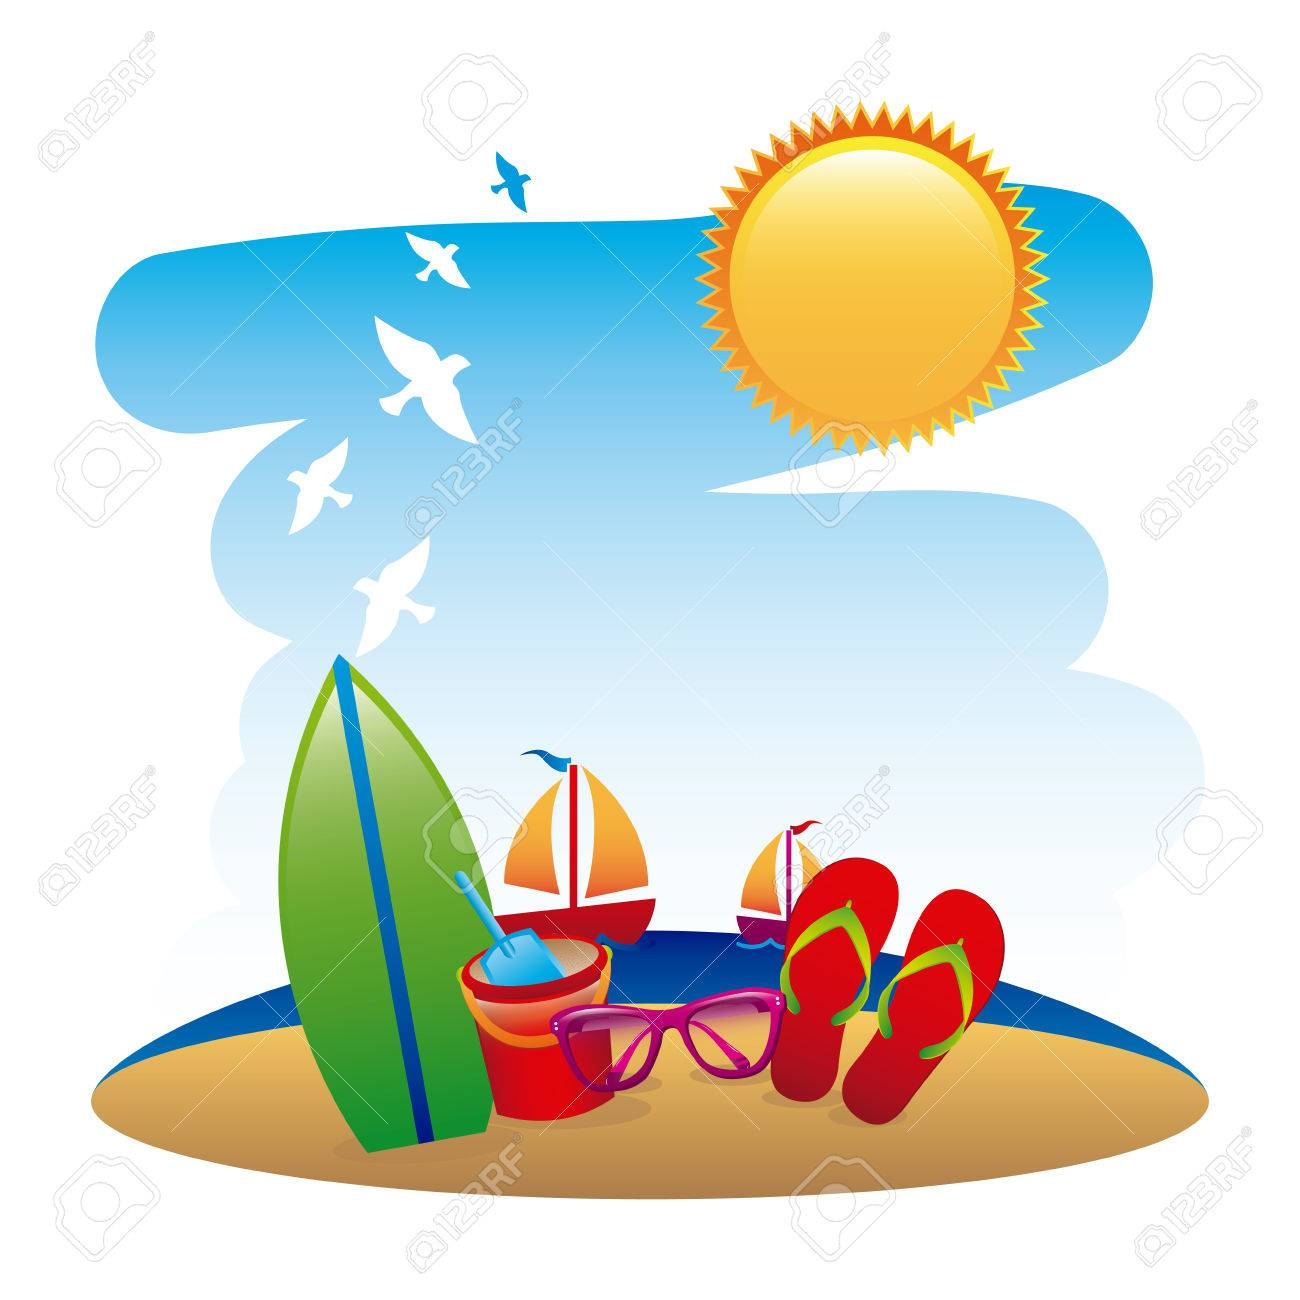 beach design over white background illustration royalty free